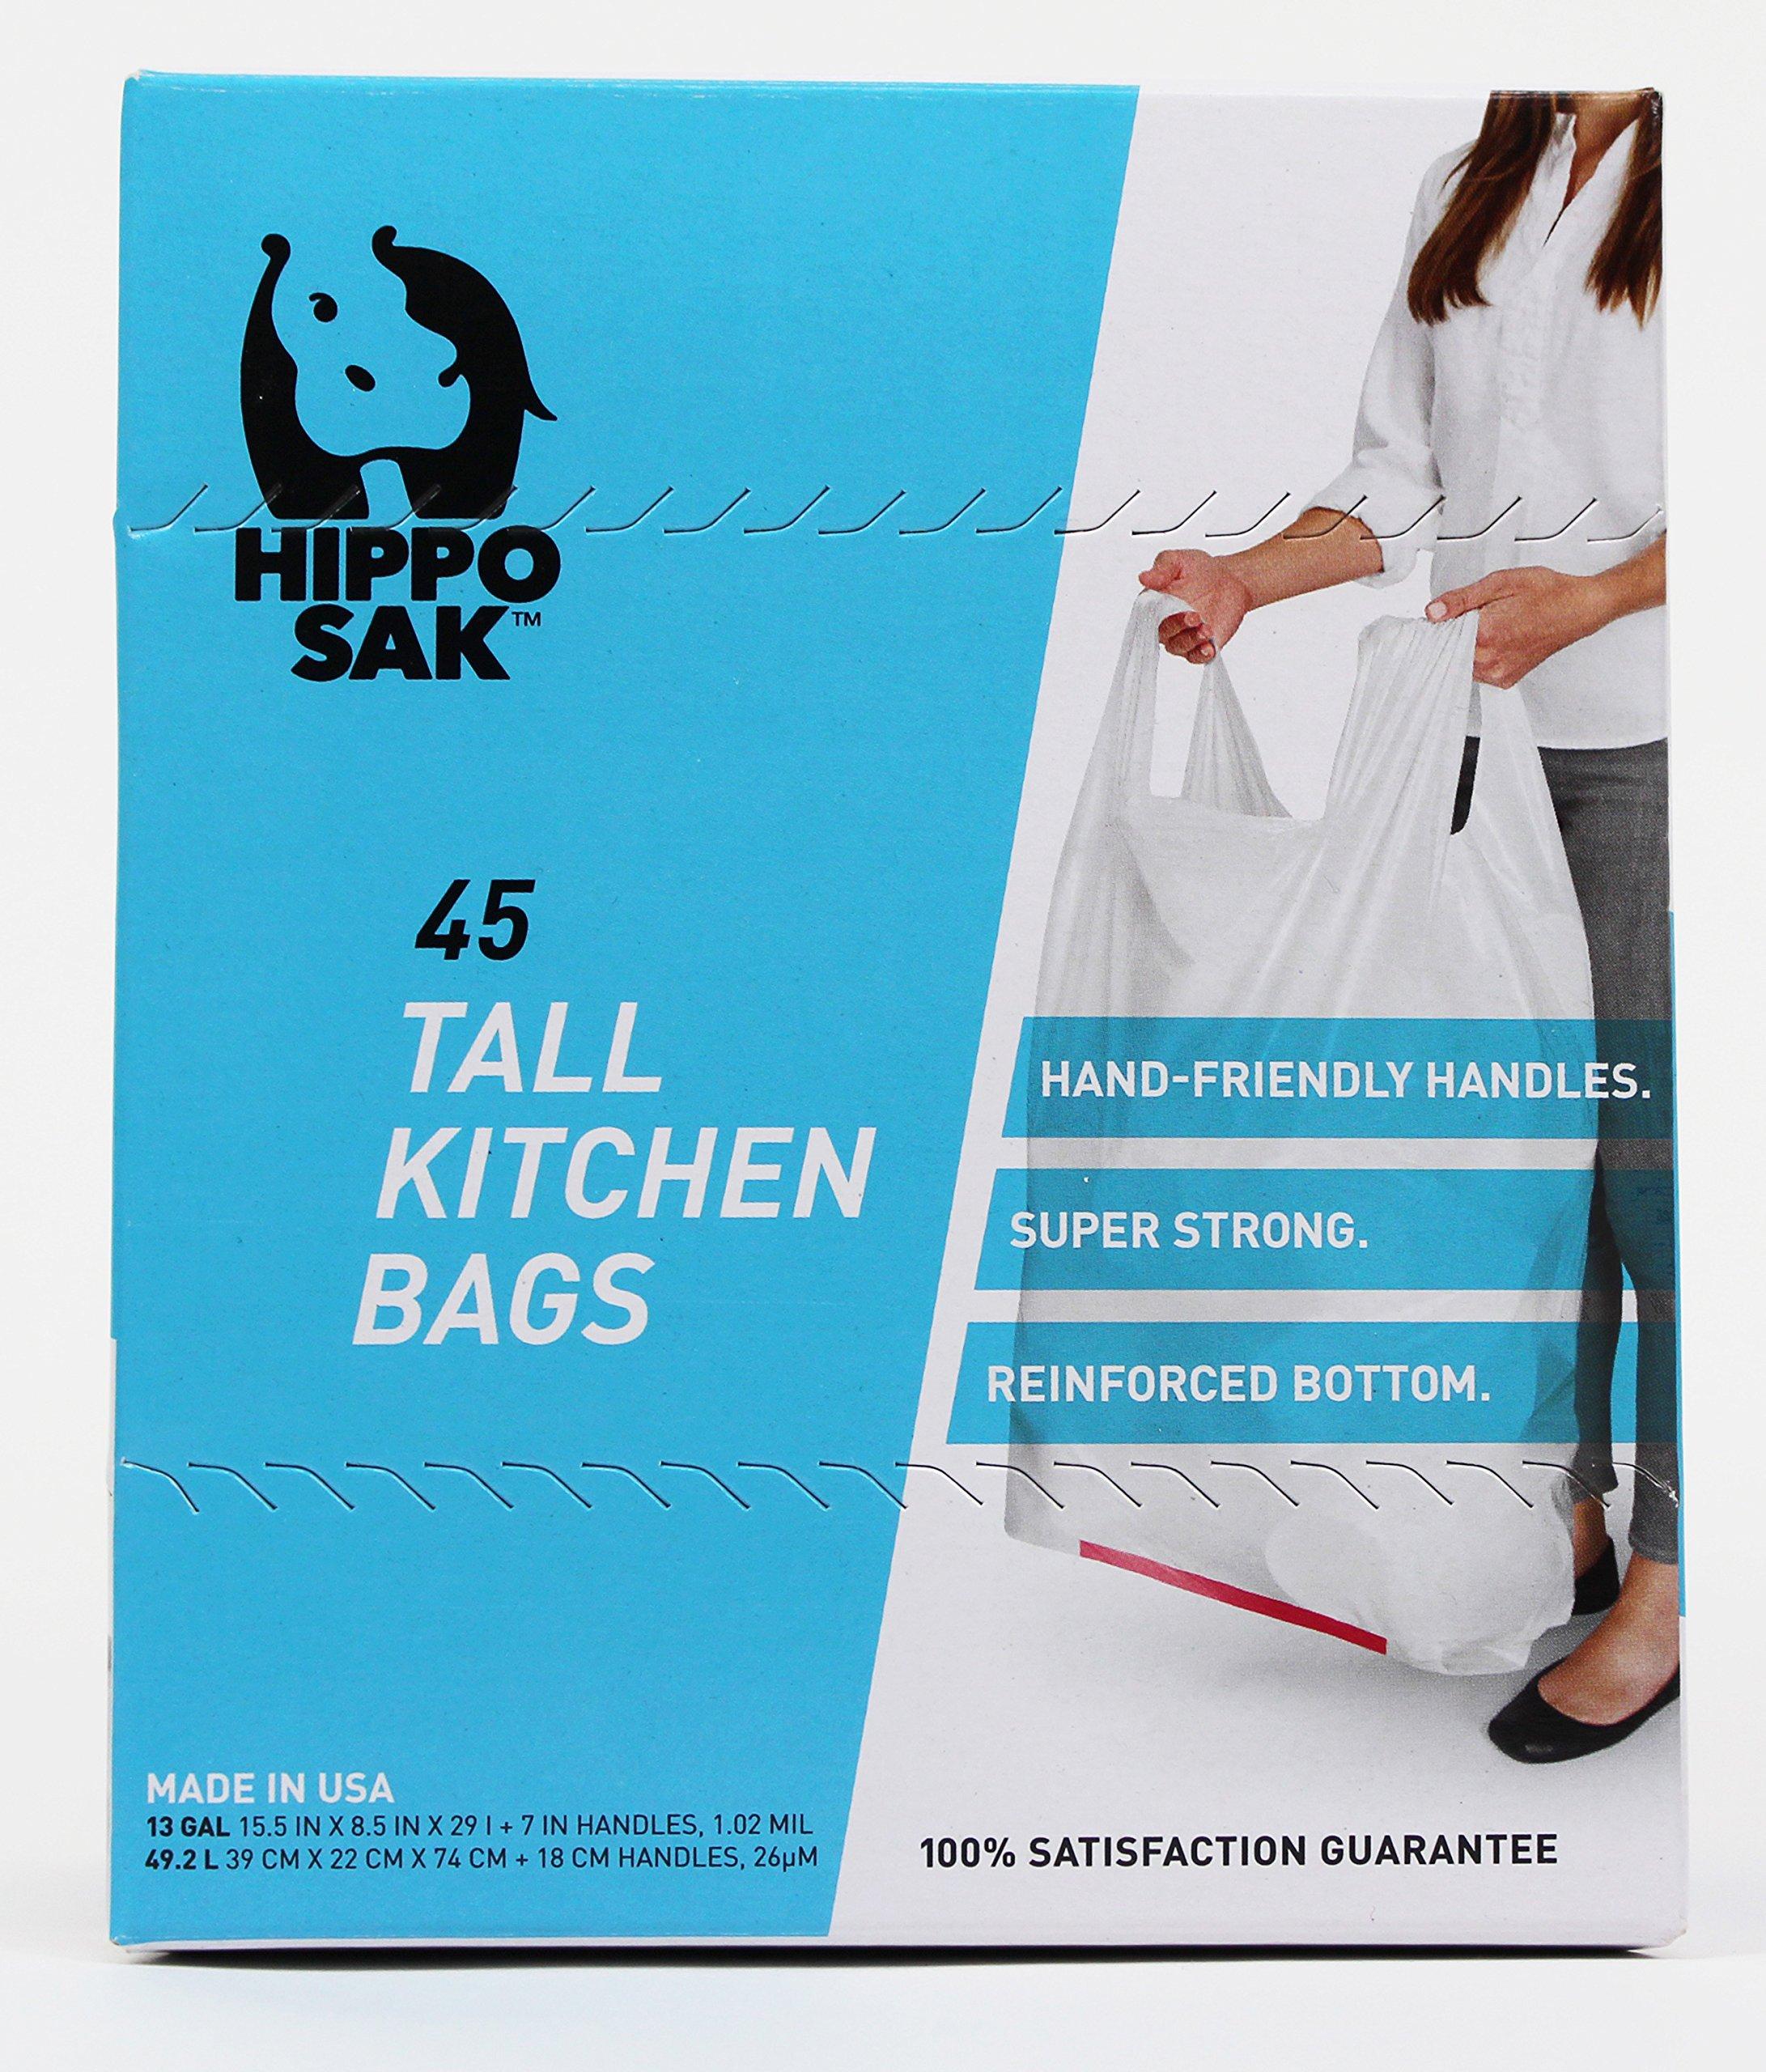 Hippo Sak 13 gallon tall kitchen trash by Hippo Sak (Image #2)